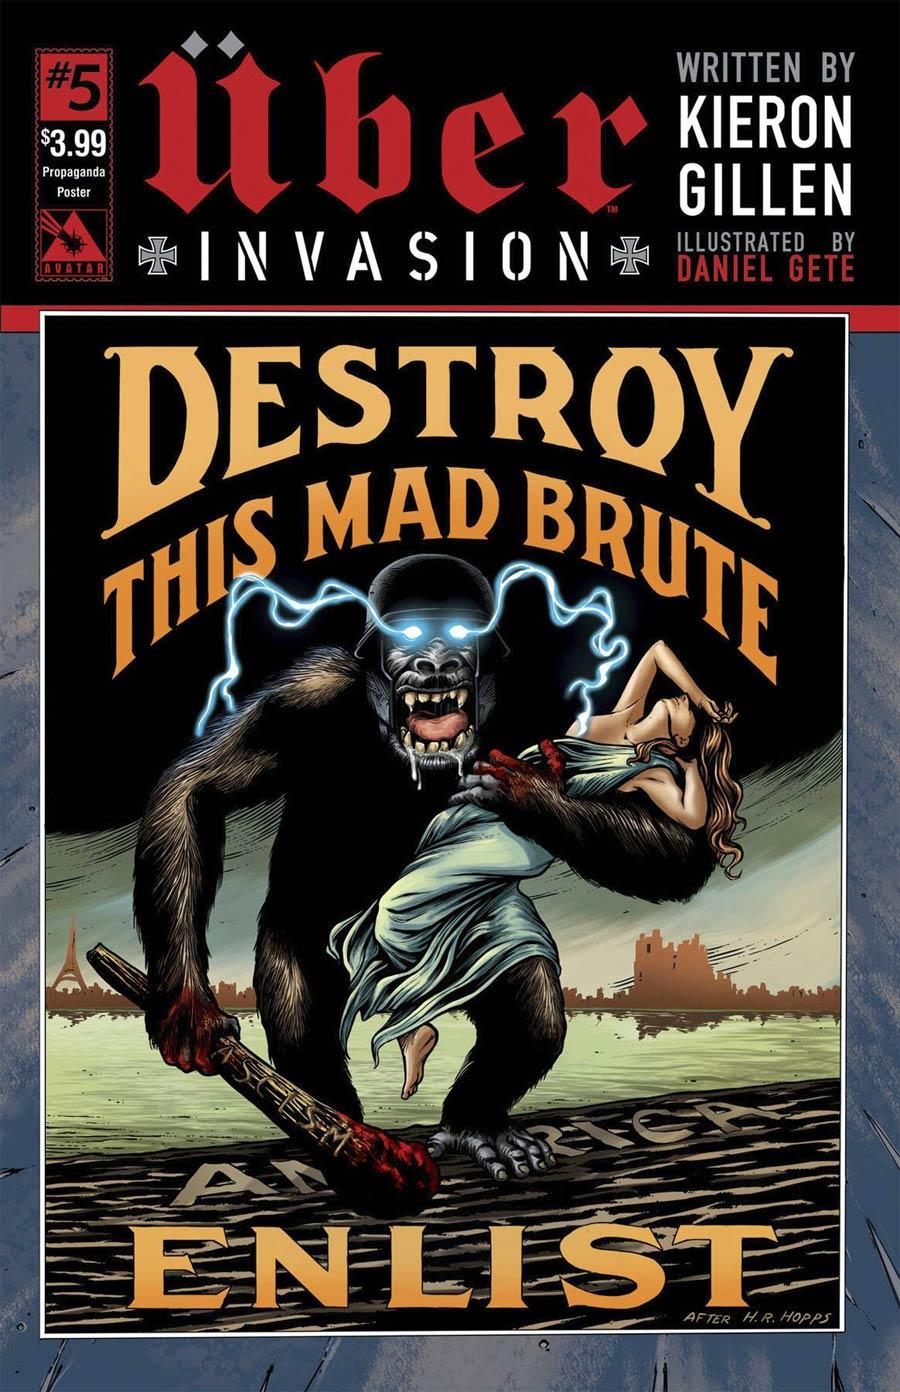 Uber Invasion #5 Cover D Propaganda Poster Cover